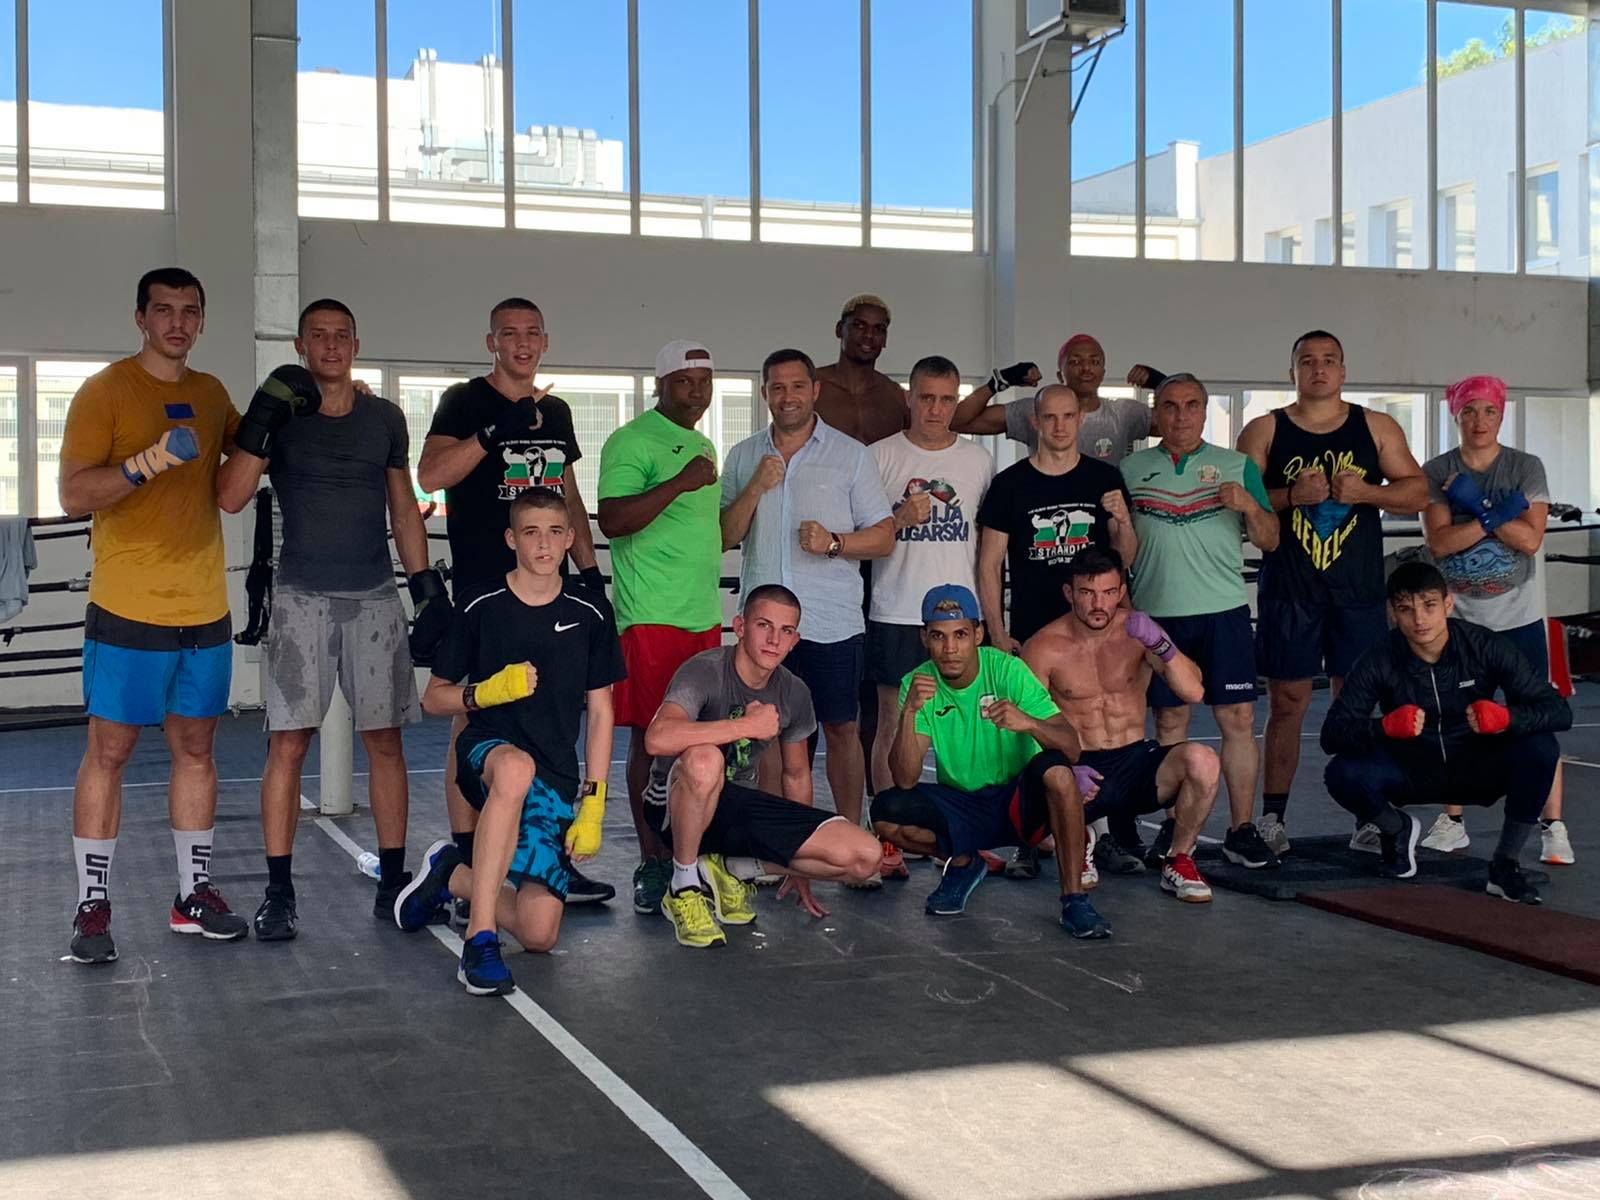 Красимир Инински посети лагера на националите по бокс